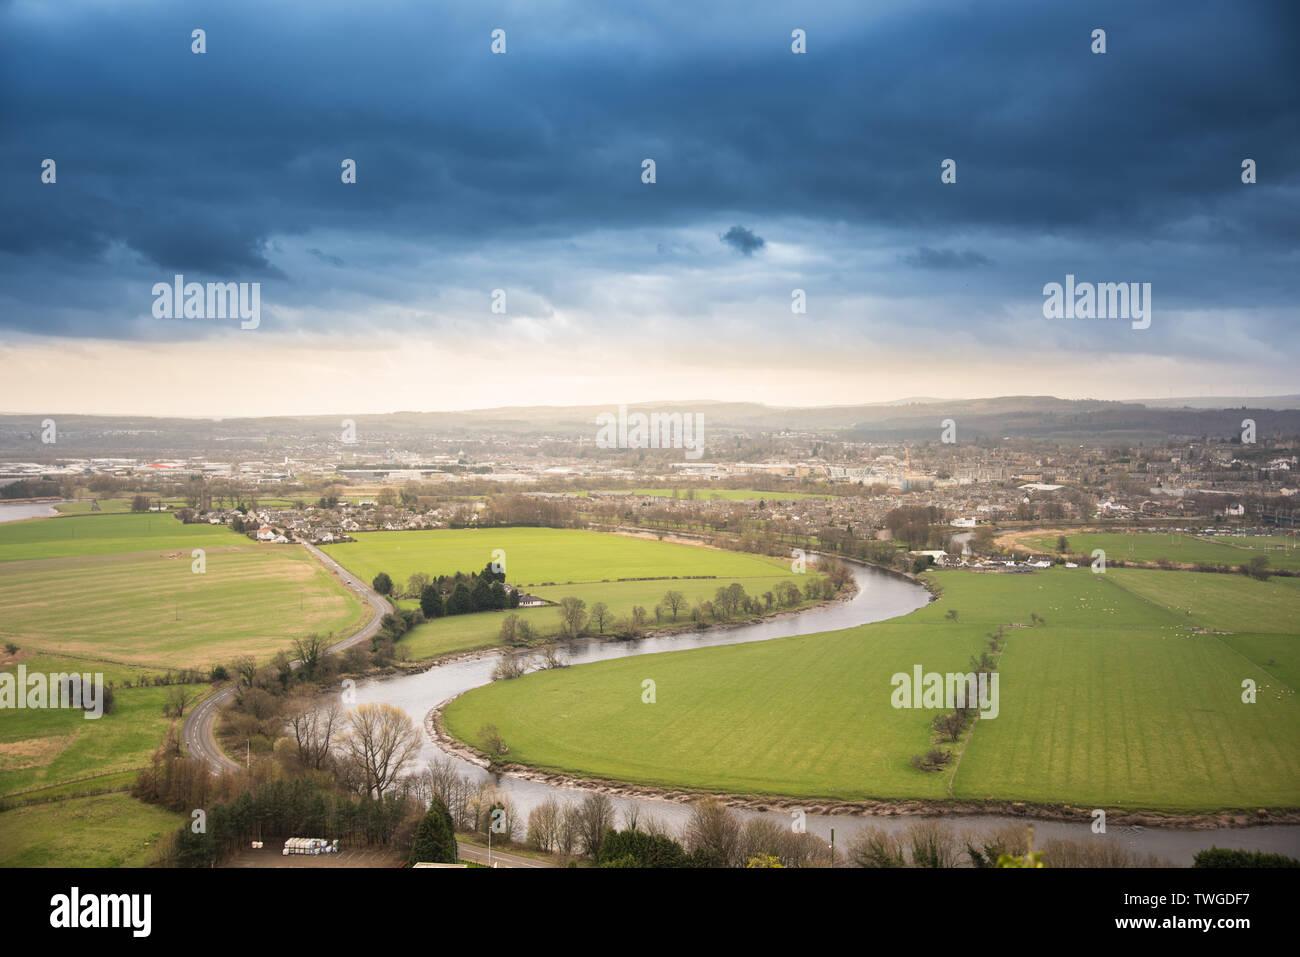 City of Stirling panorama - Scotland, urban photo - Stock Image